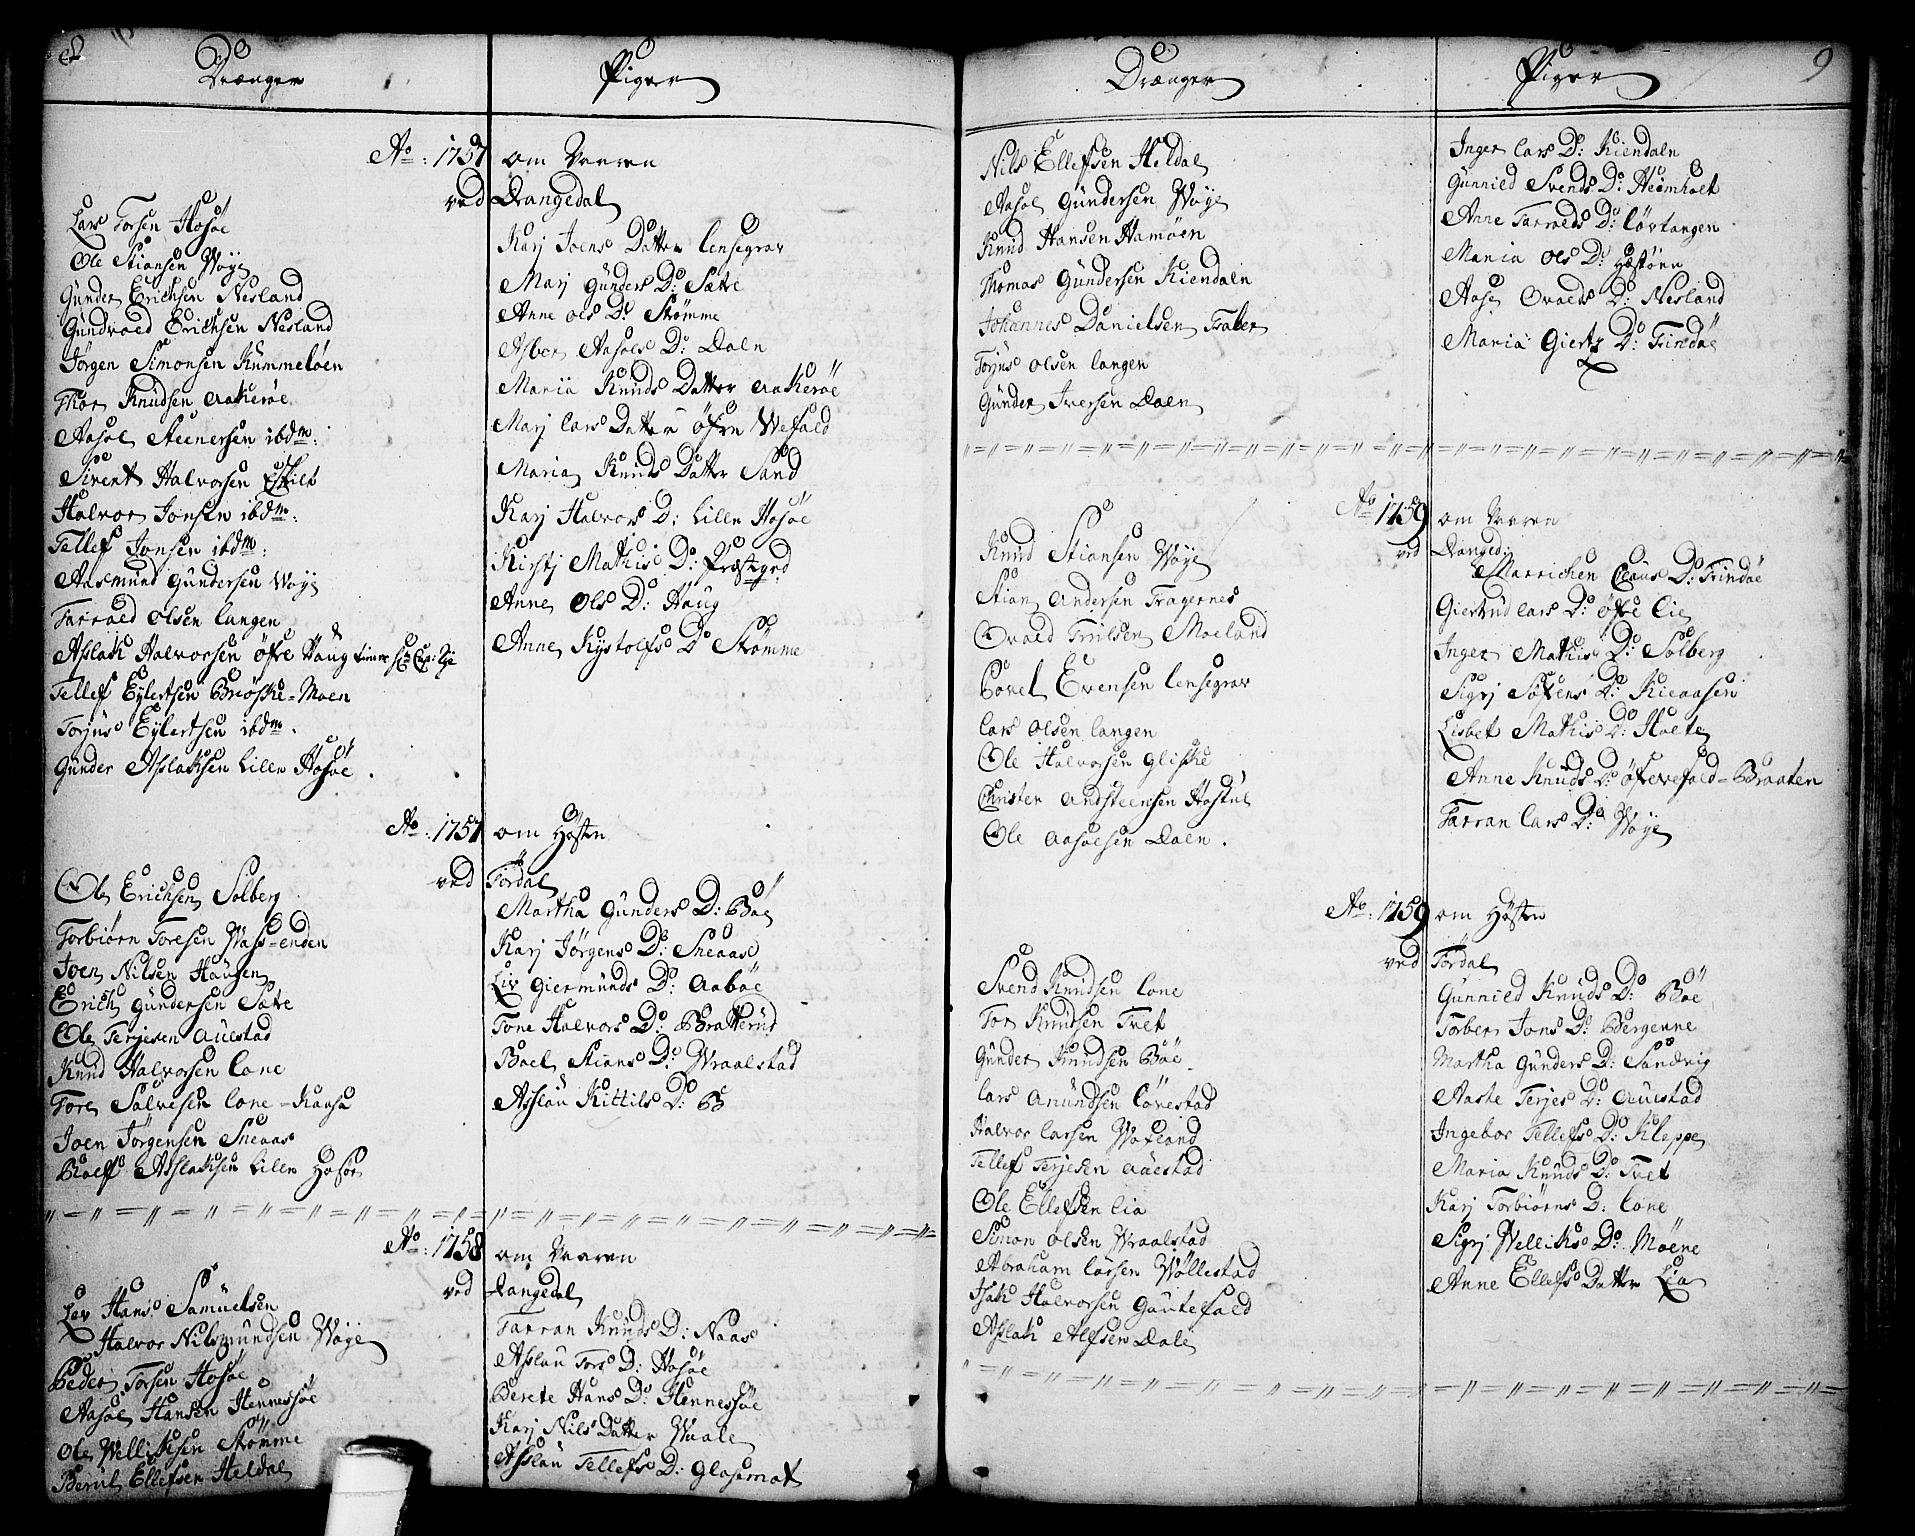 SAKO, Drangedal kirkebøker, F/Fa/L0001: Ministerialbok nr. 1, 1697-1767, s. 8-9